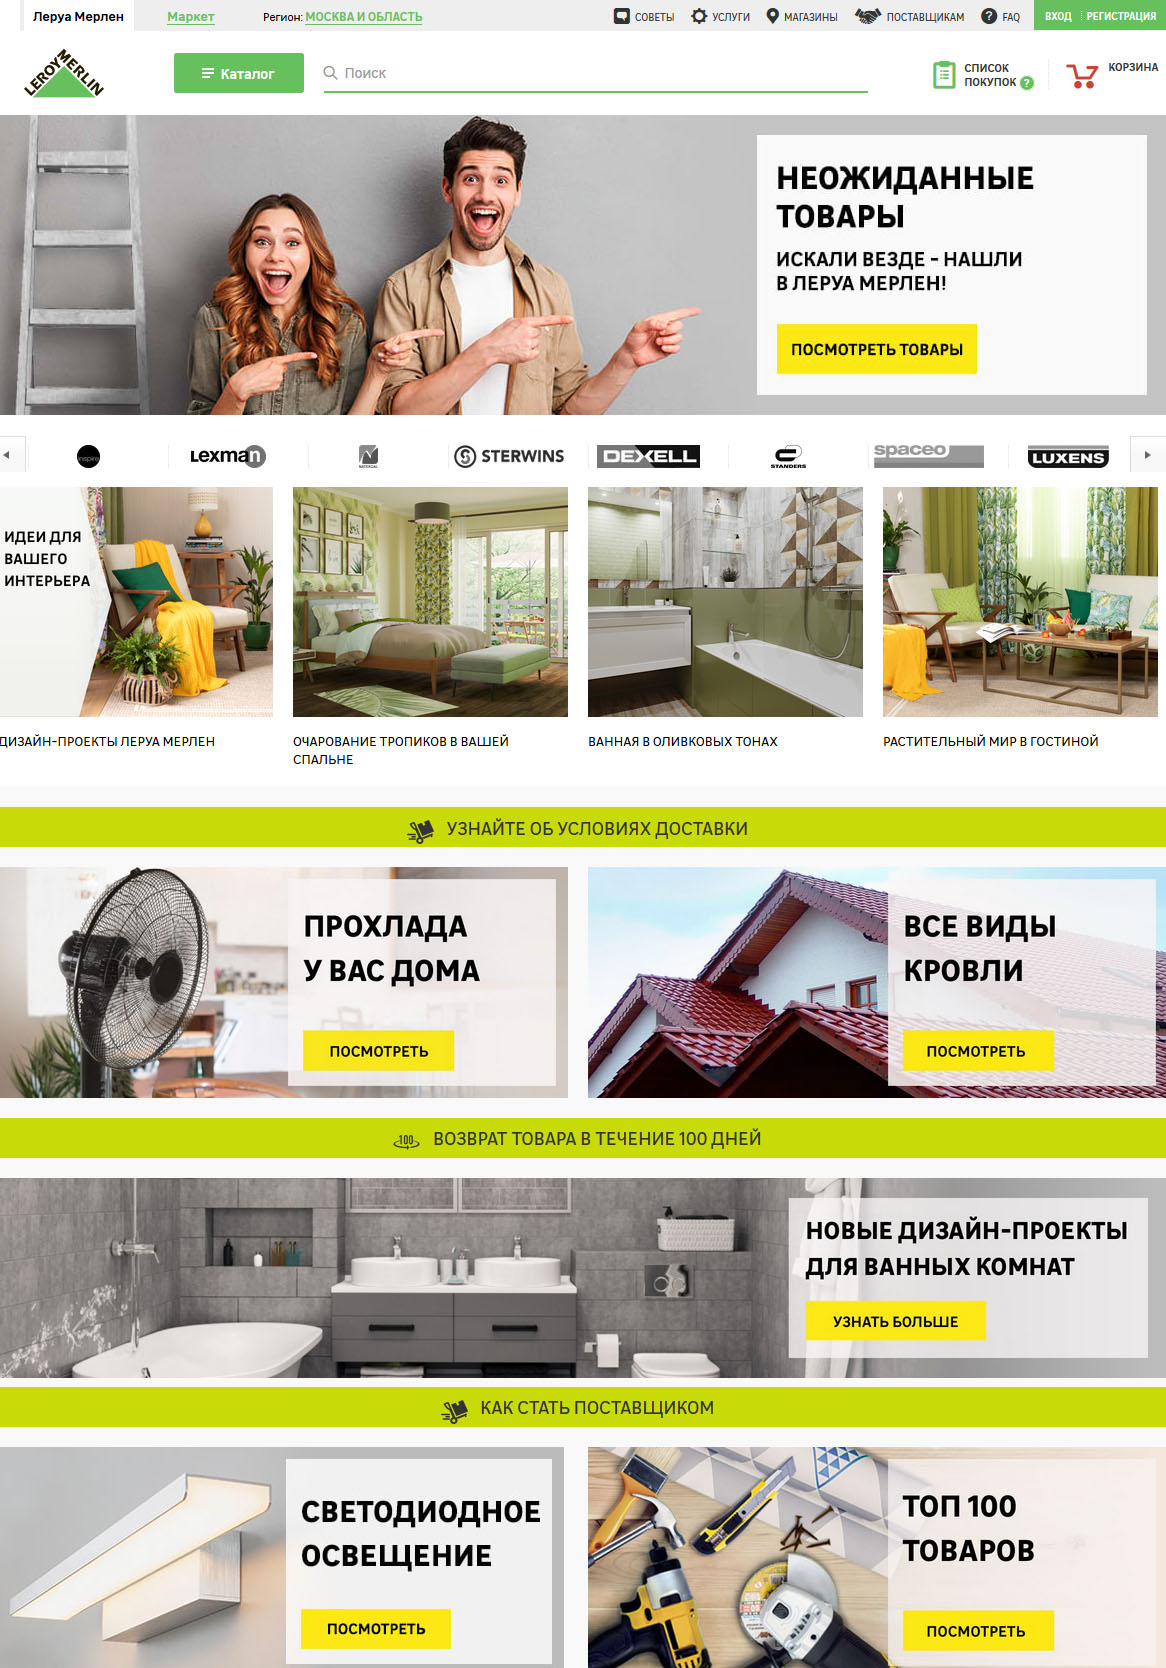 леруа мерлен интернет магазин леруамерлен официальный